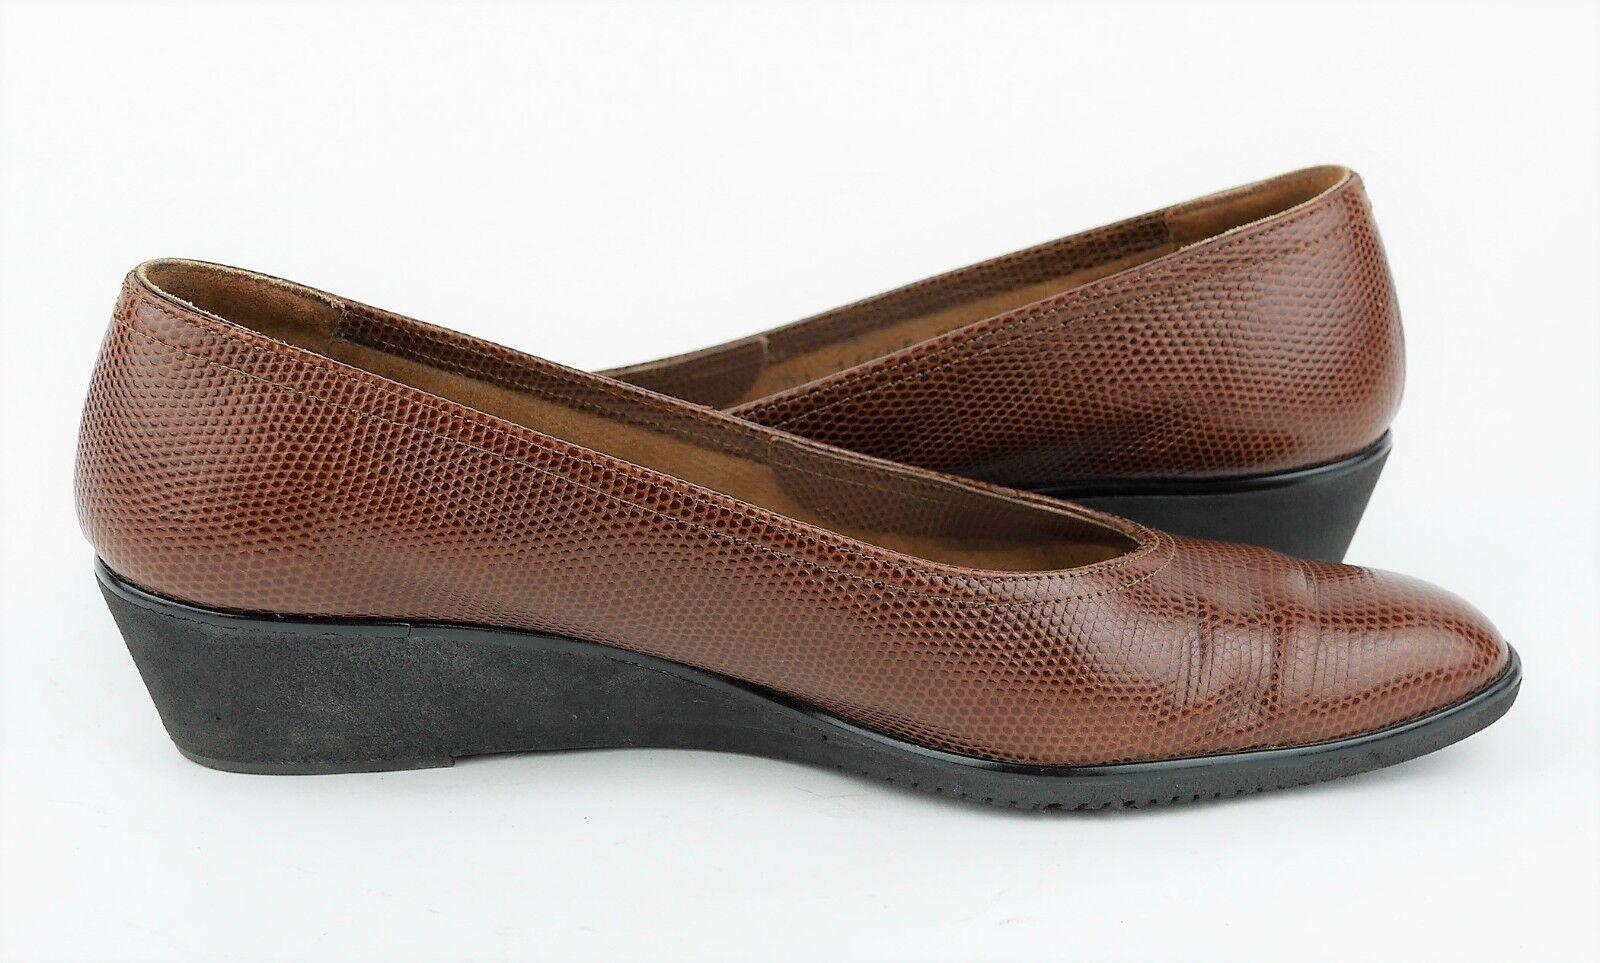 SALVATORE FERRAGAMO BOUTIQUE Sz 8.5 - braun Pebbled Pebbled Pebbled Leather Low Heel Pumps schuhe fc5cf7